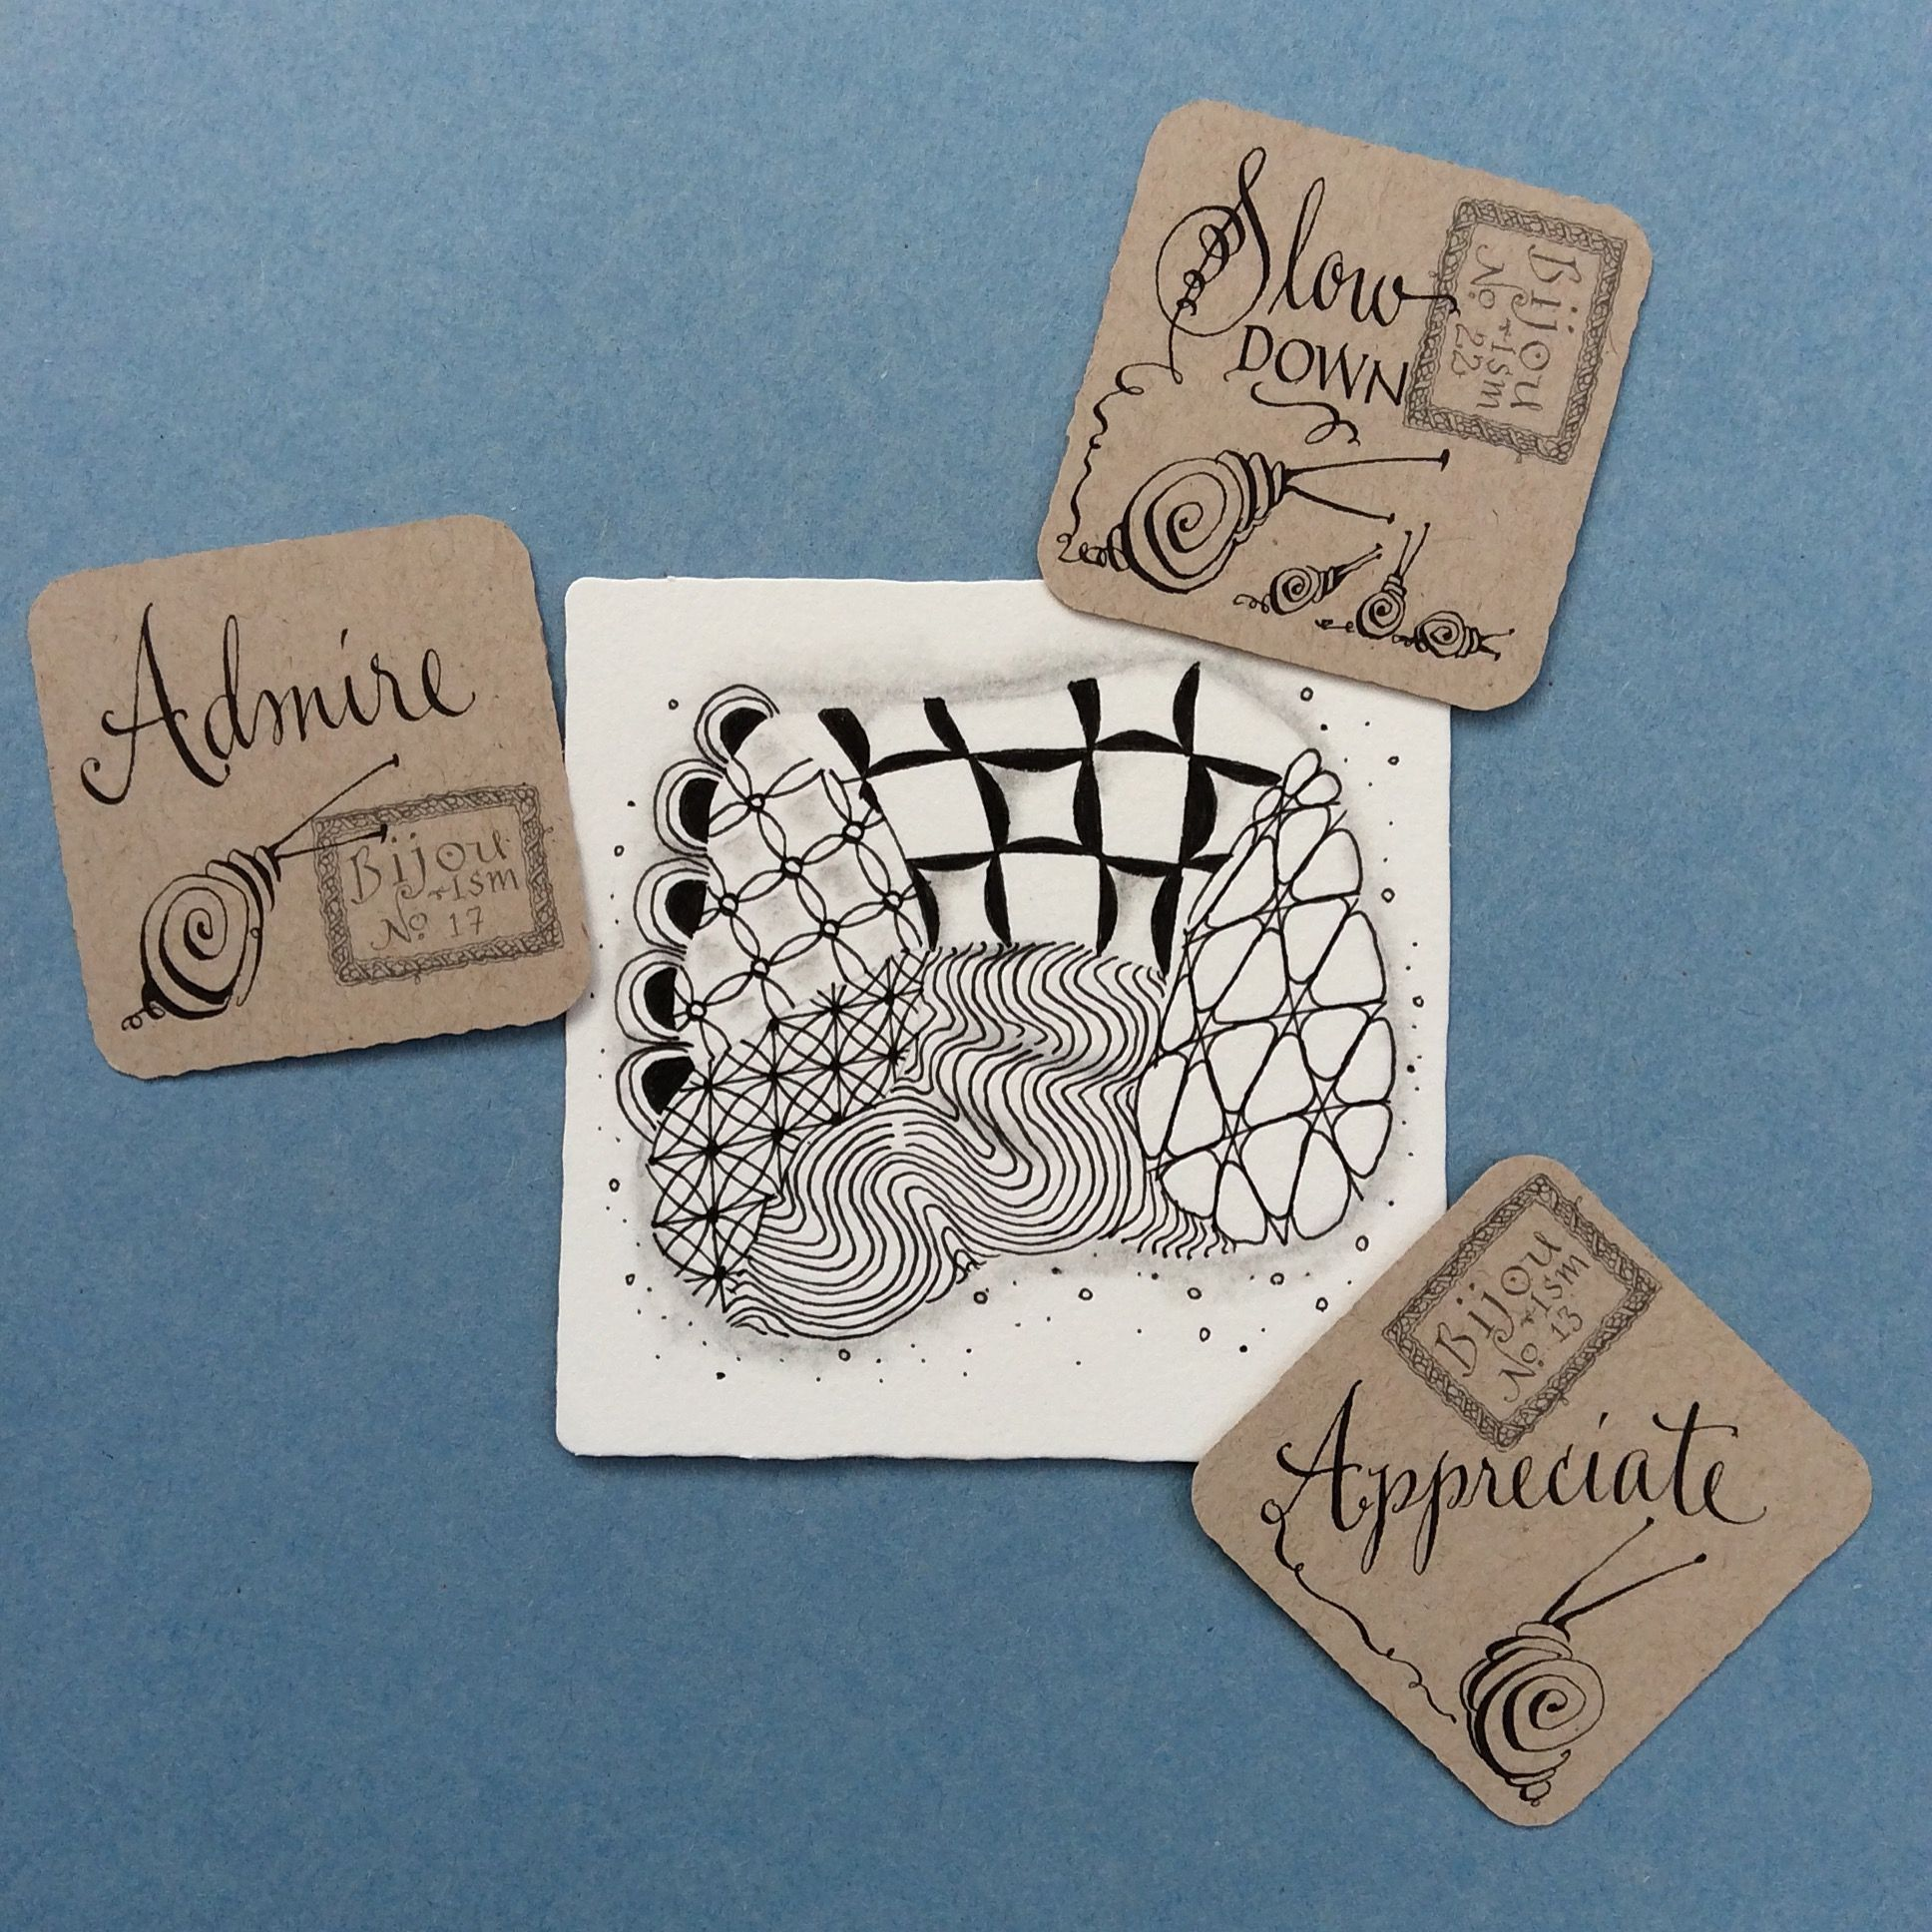 Zentangle By Nancy Domnauer Certified Zentangle Teacher